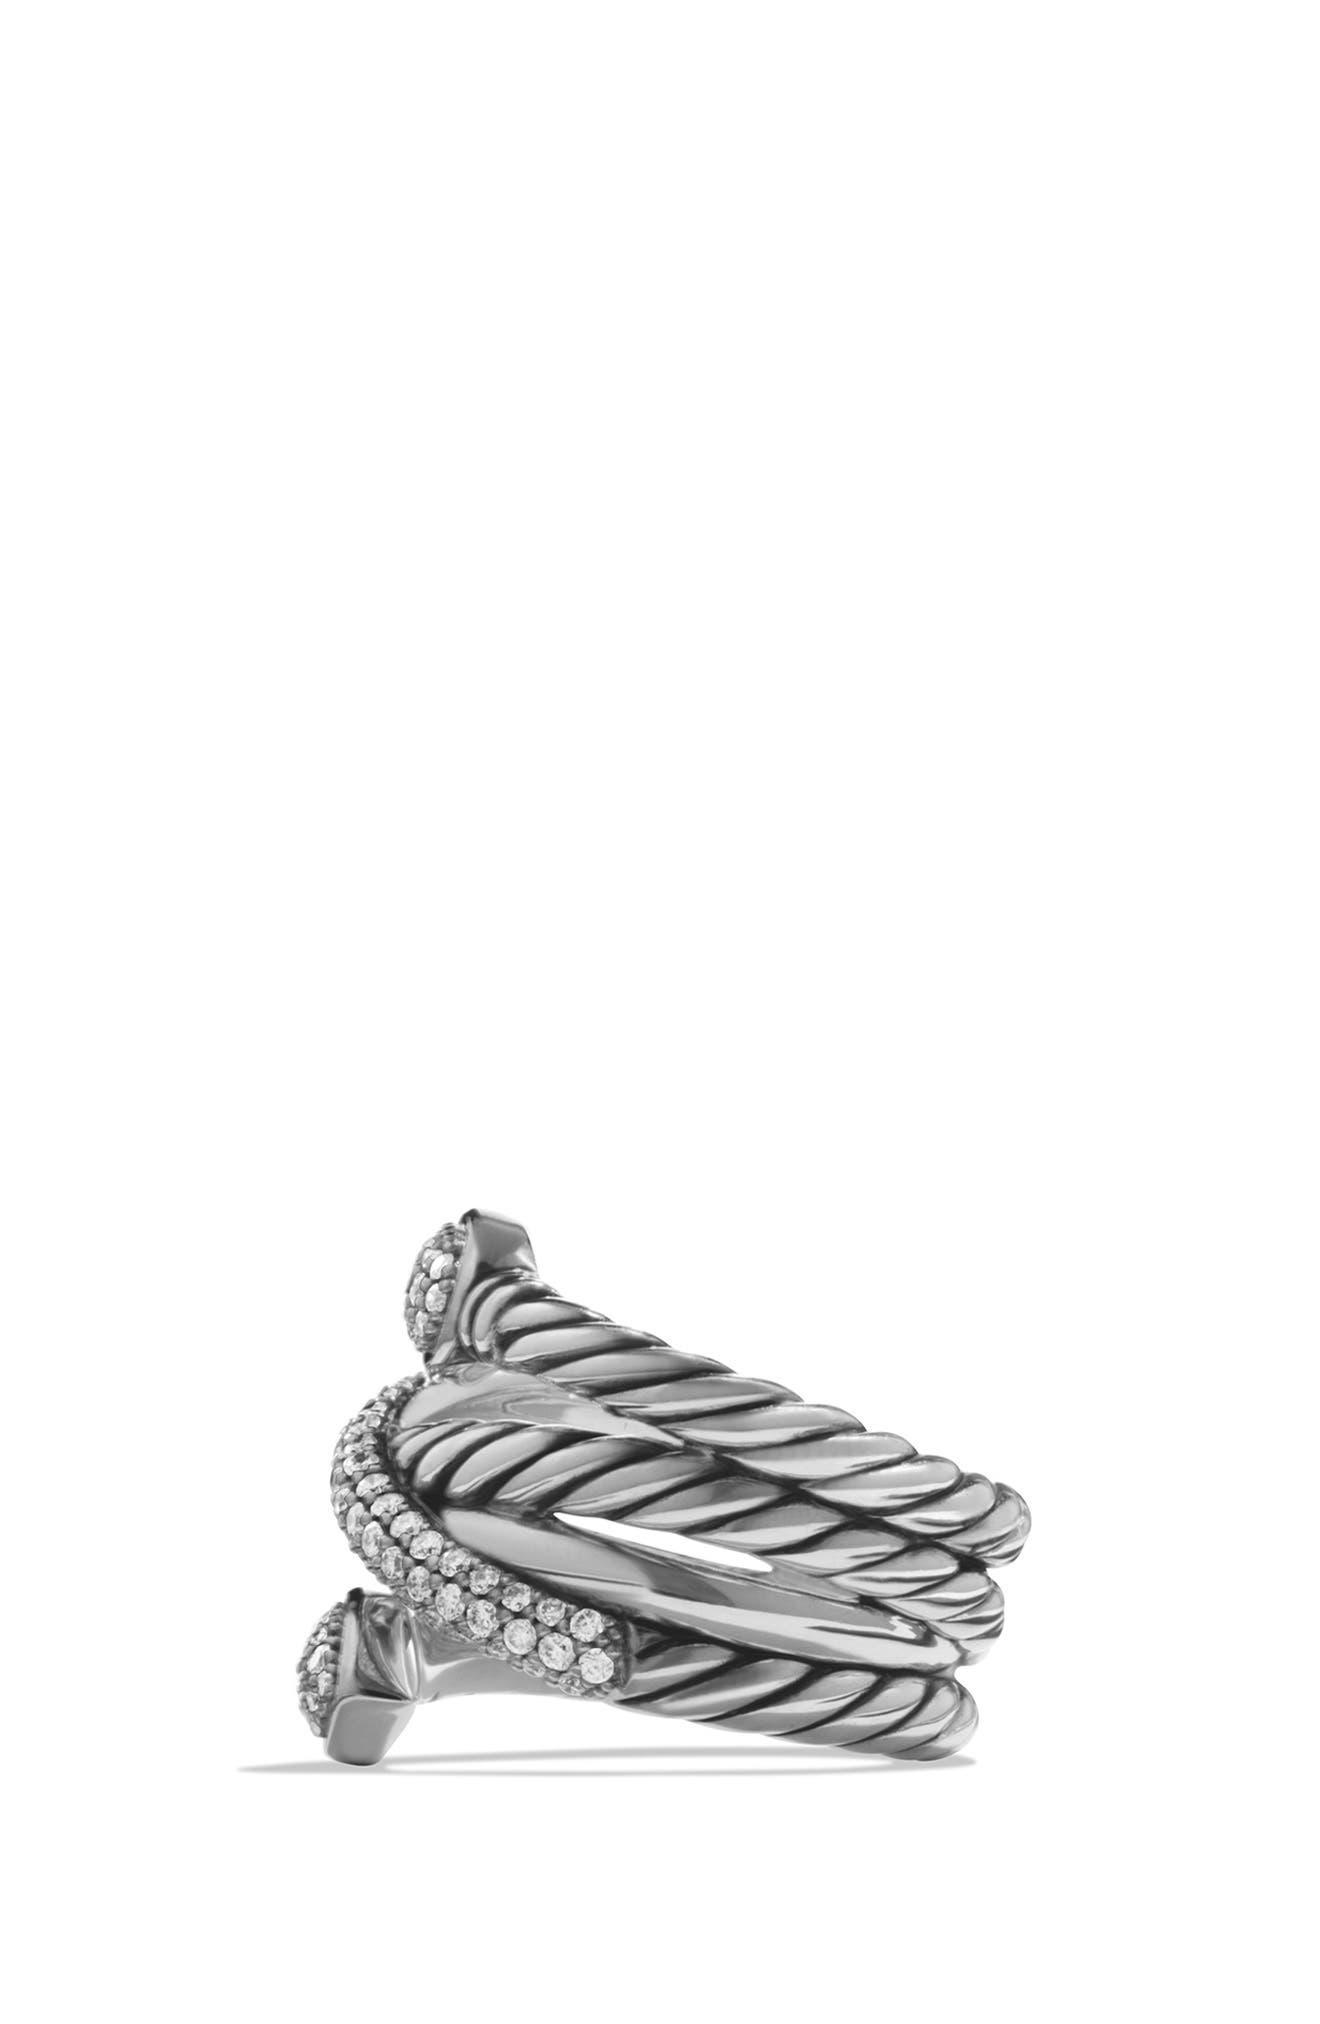 'Renaissance' Ring with Diamonds,                             Alternate thumbnail 7, color,                             040